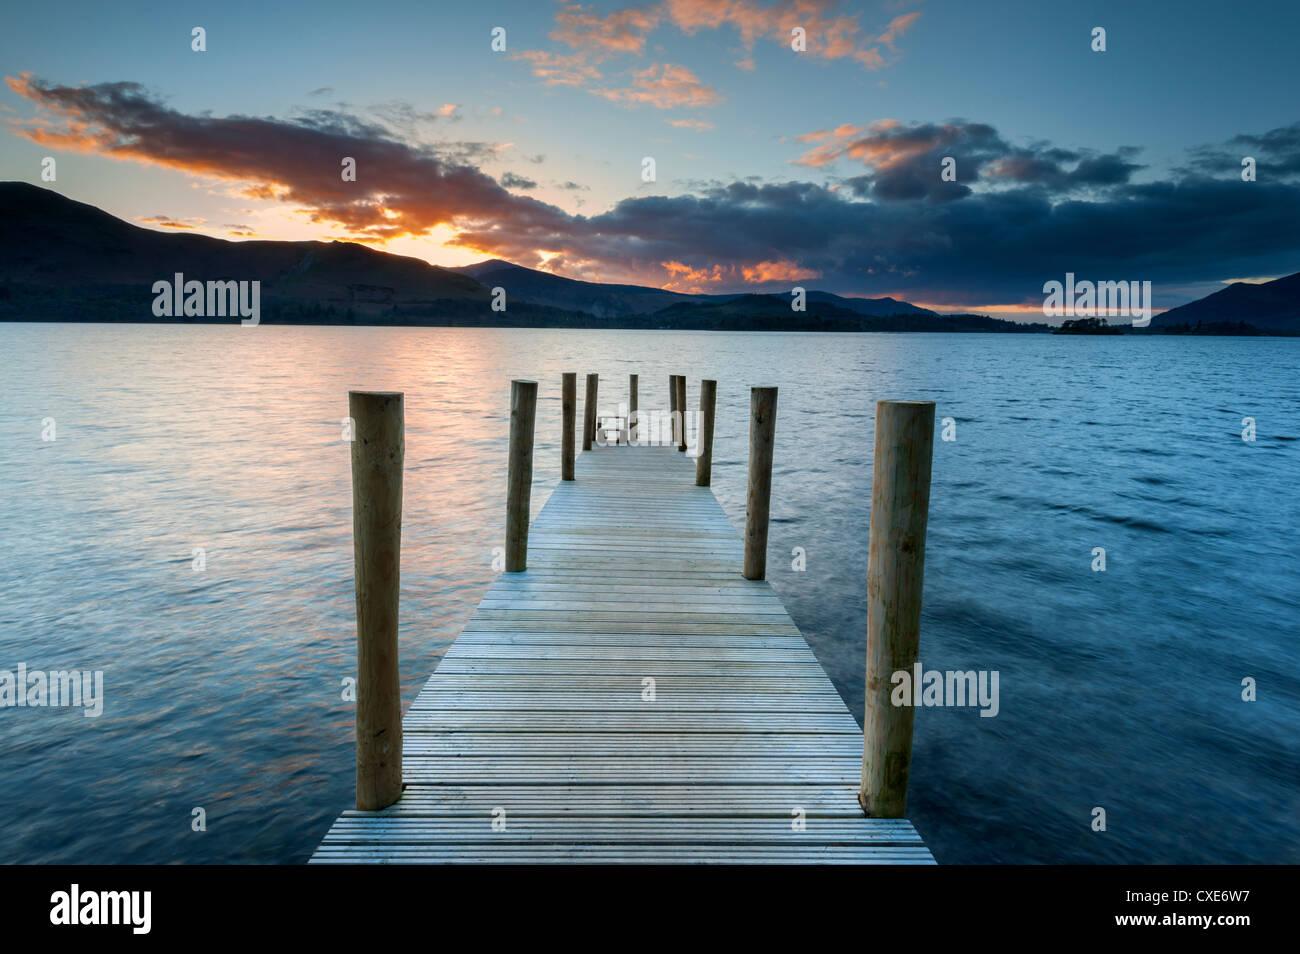 Sonnenuntergang am Ashness Steg, Barrow Bay, Derwent Water, Keswick, Nationalpark Lake District, Cumbria, England Stockbild